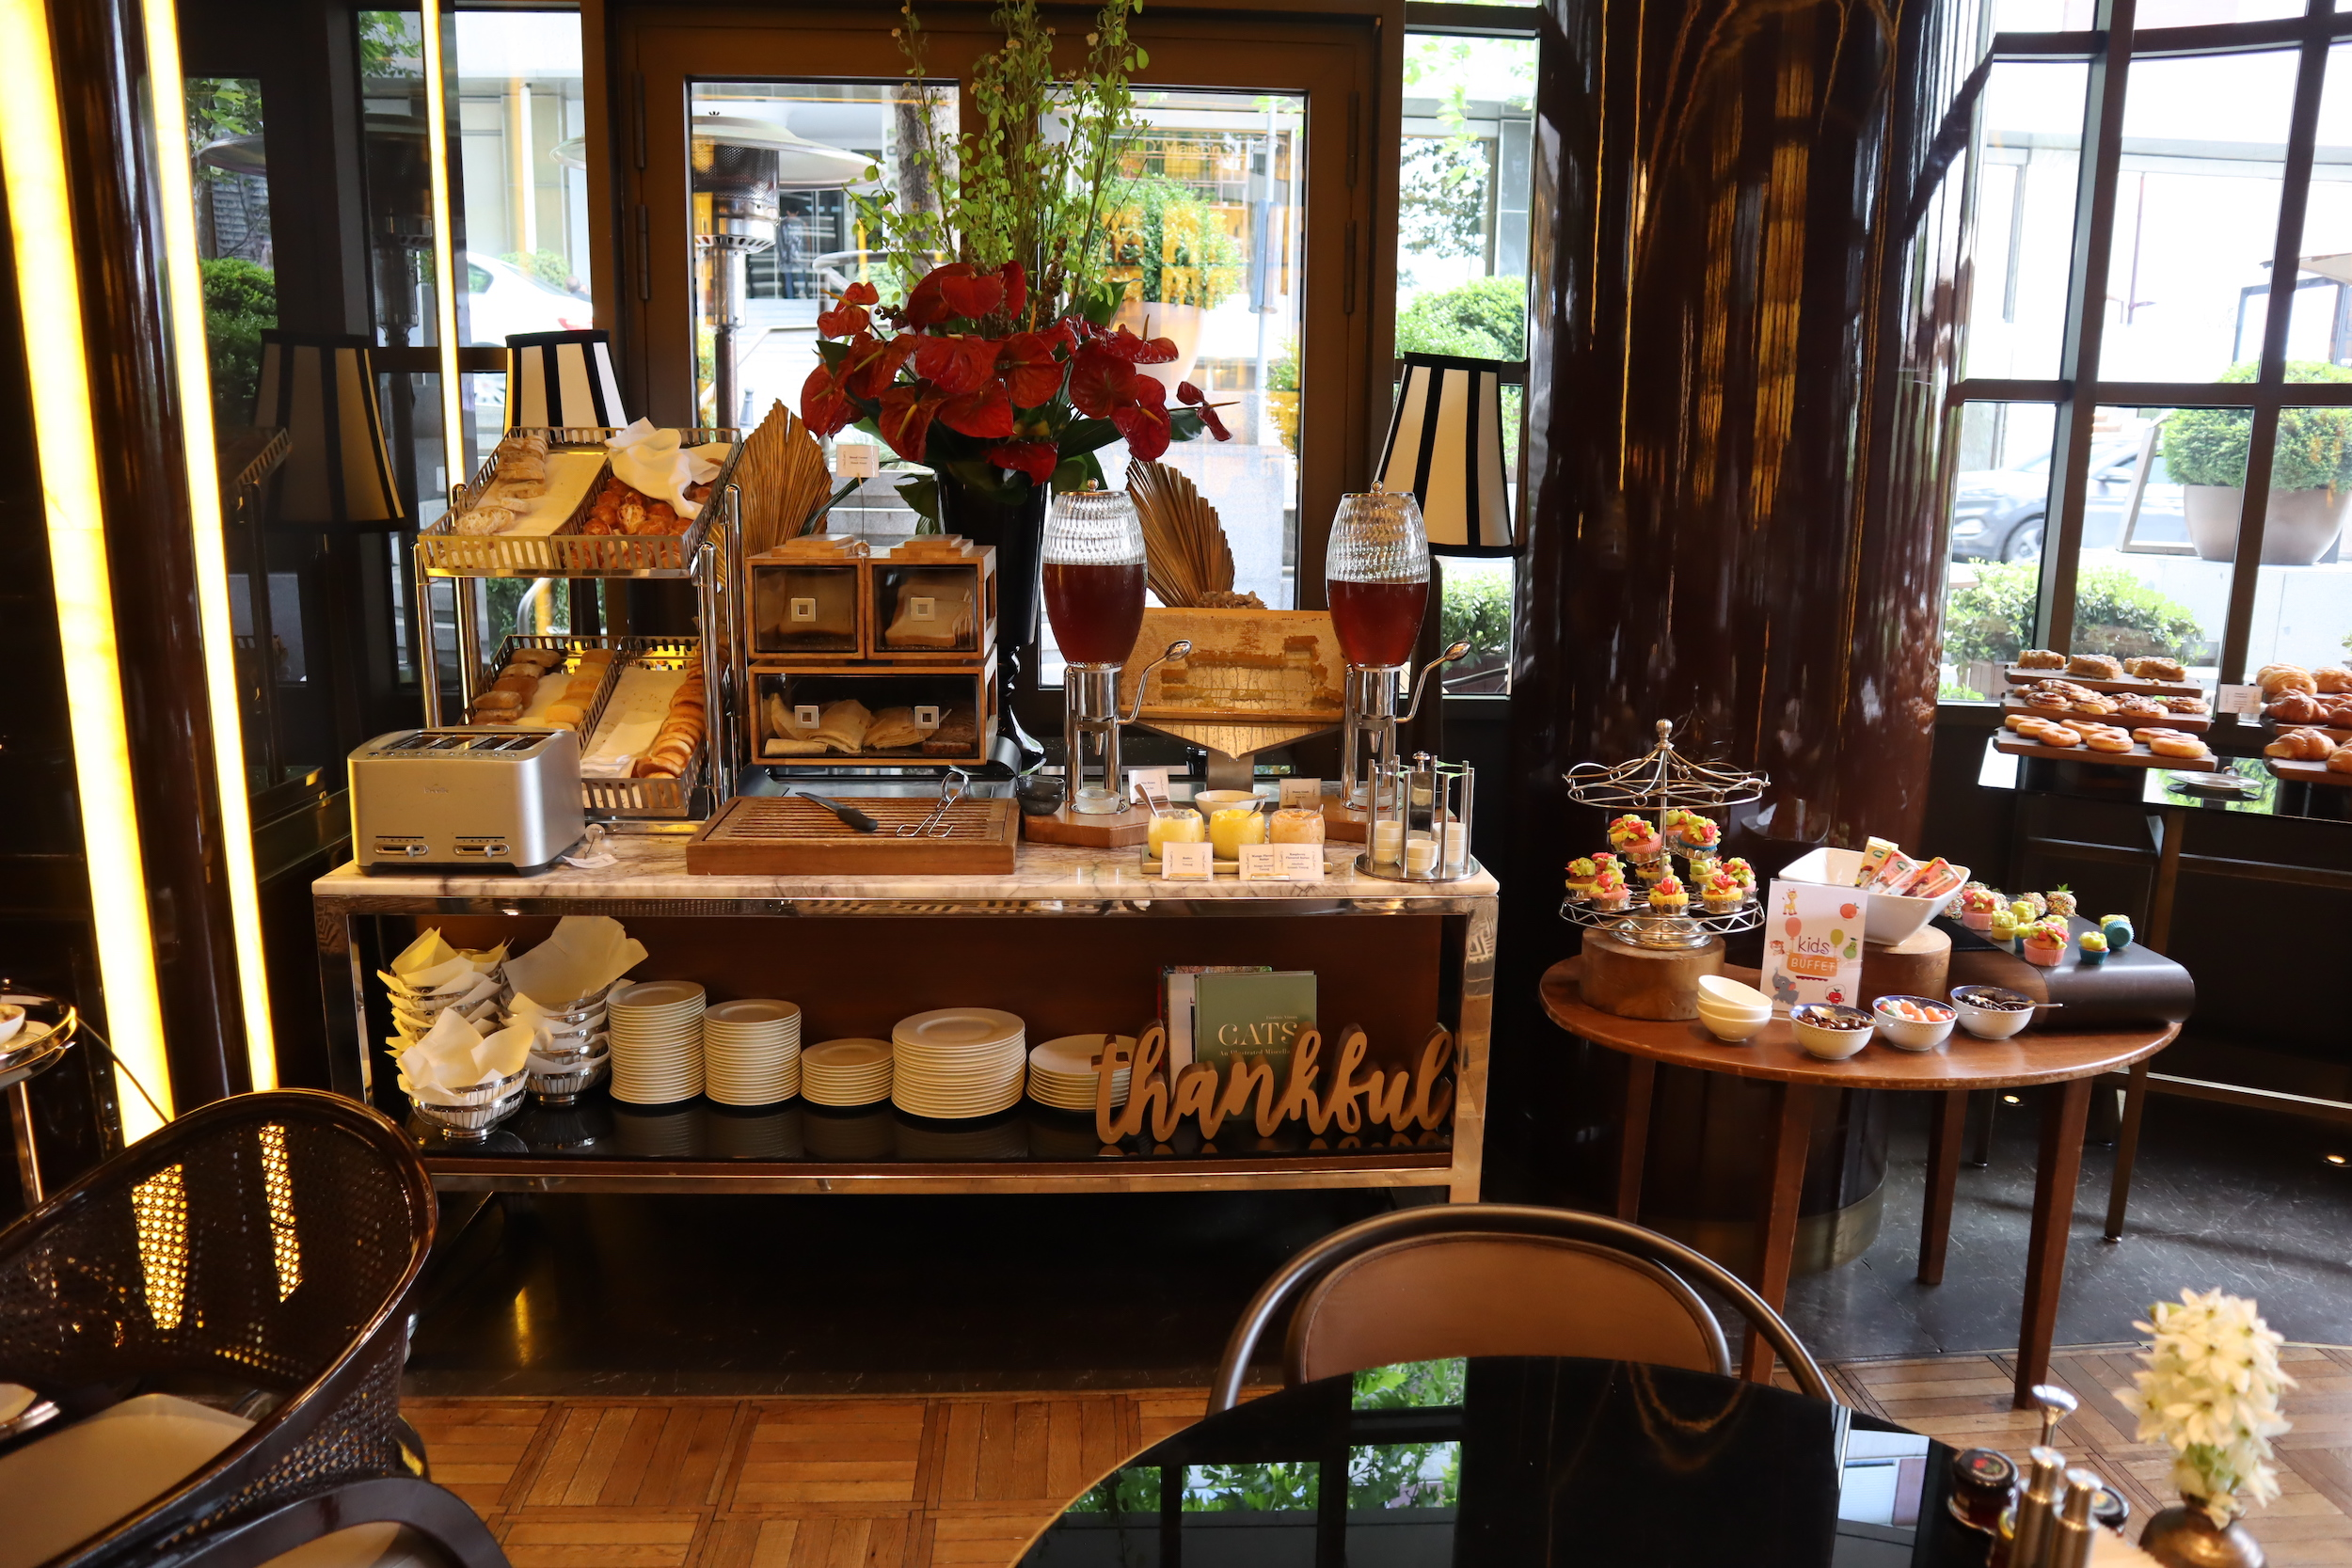 St. Regis Istanbul – Breakfast pastry spread